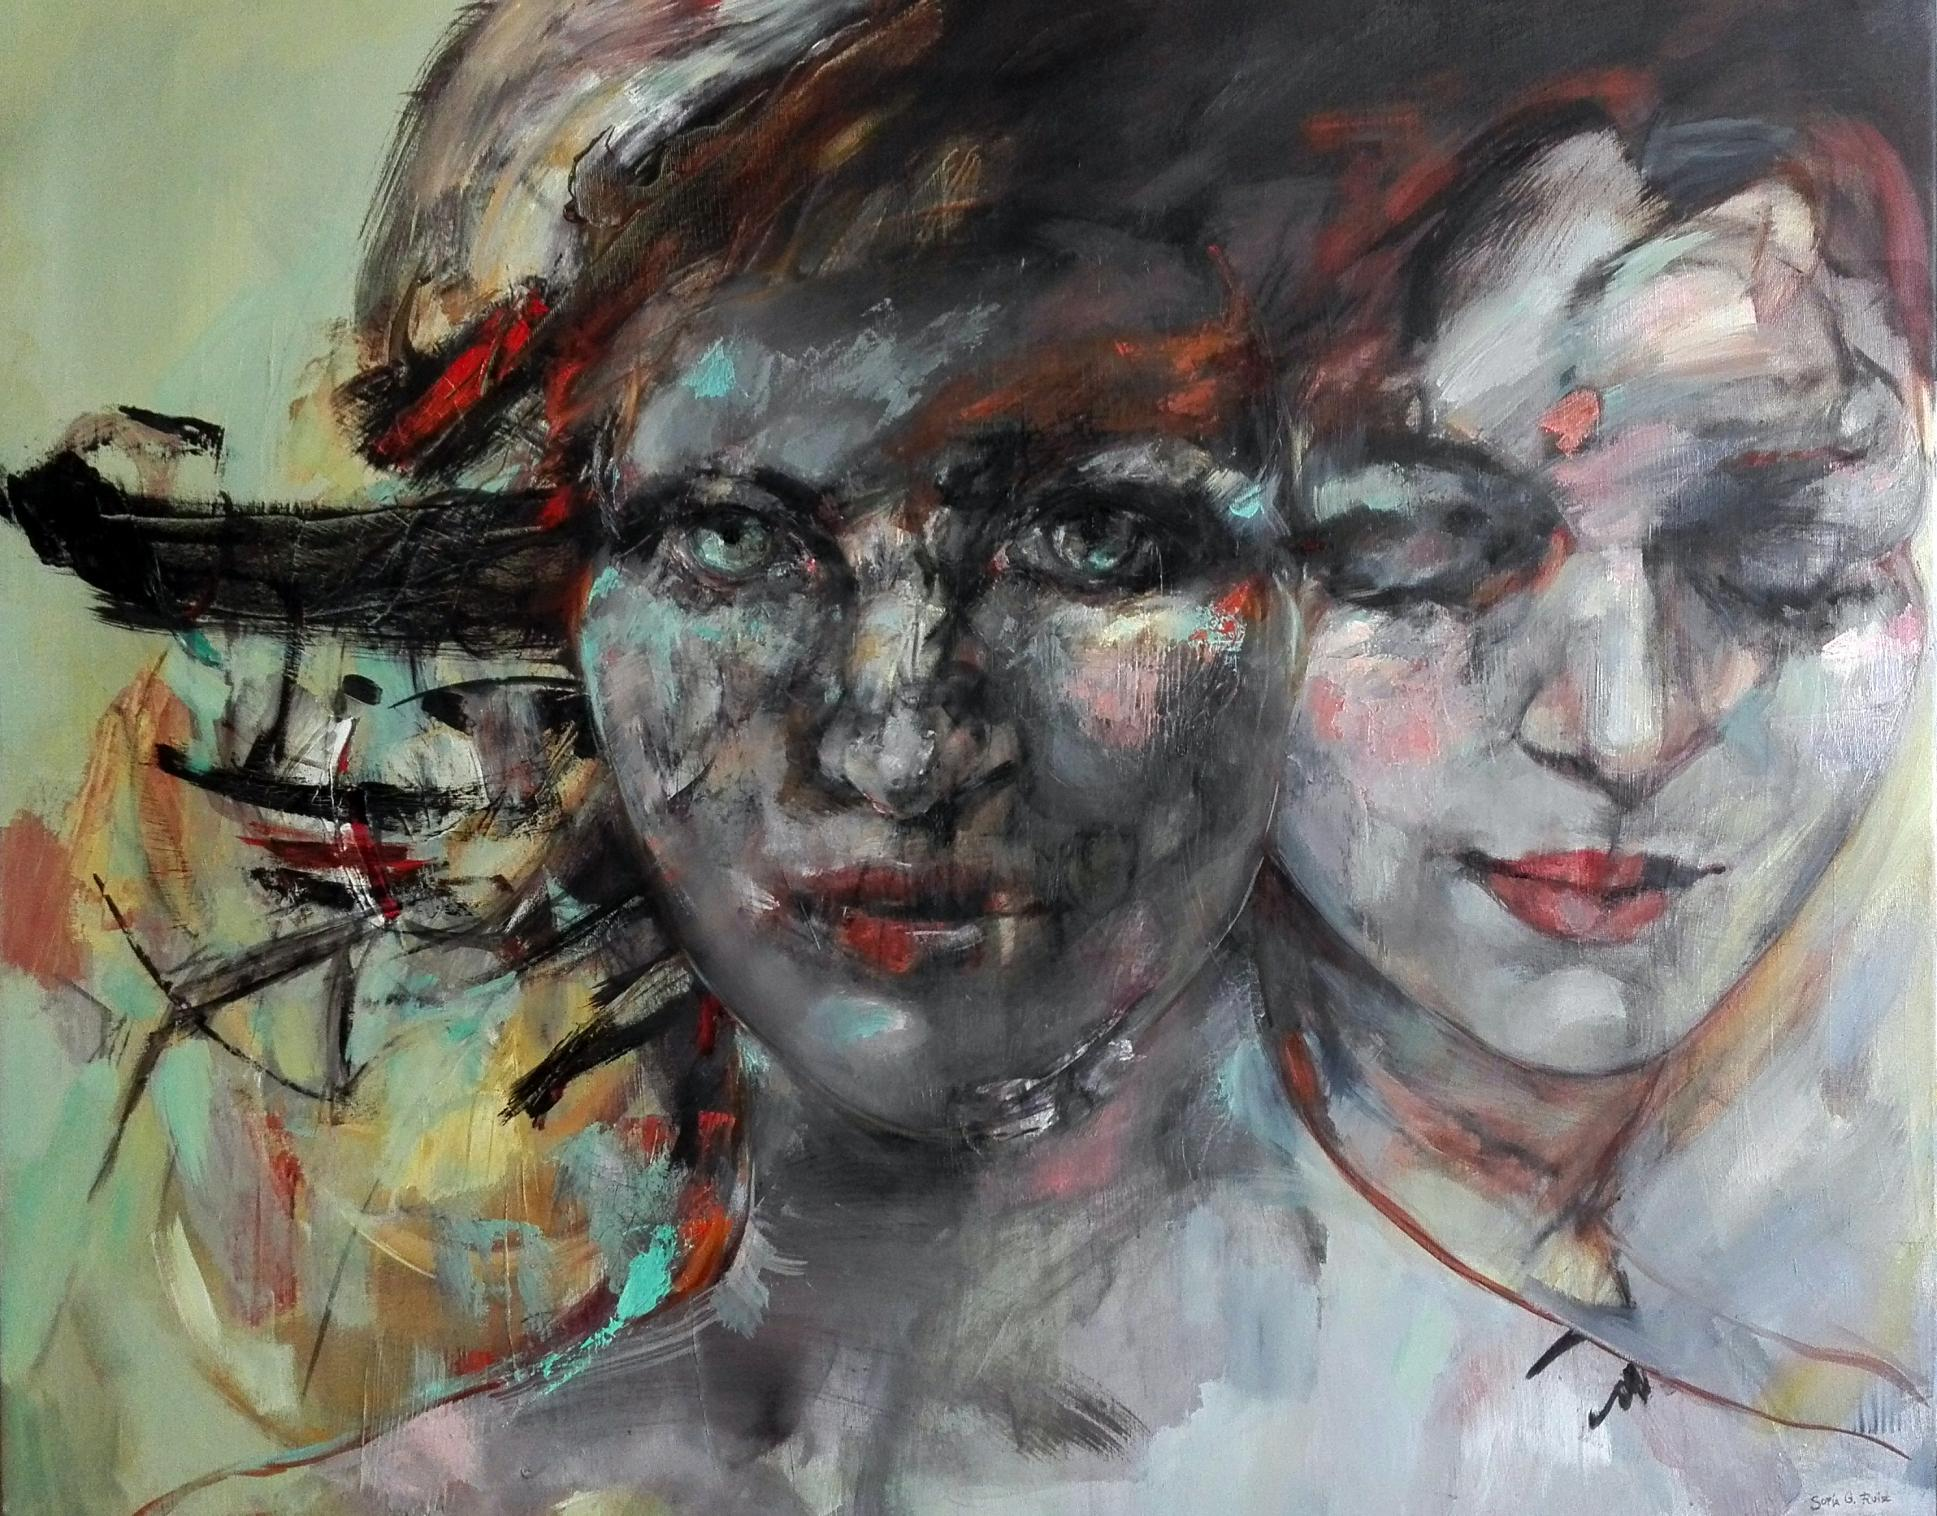 Maga y sombra (2018) - Sofia G. Ruiz